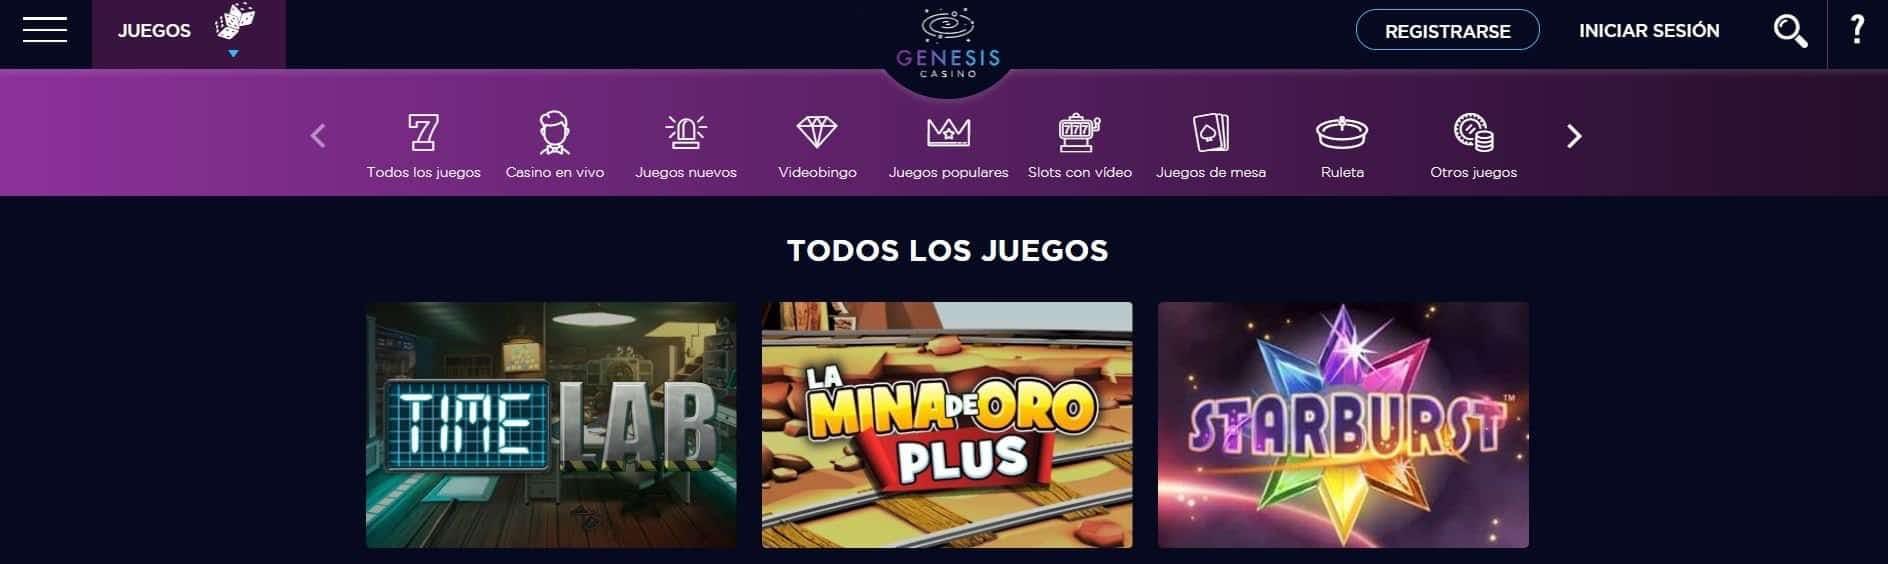 Casinos habanero Brazil frases 243118